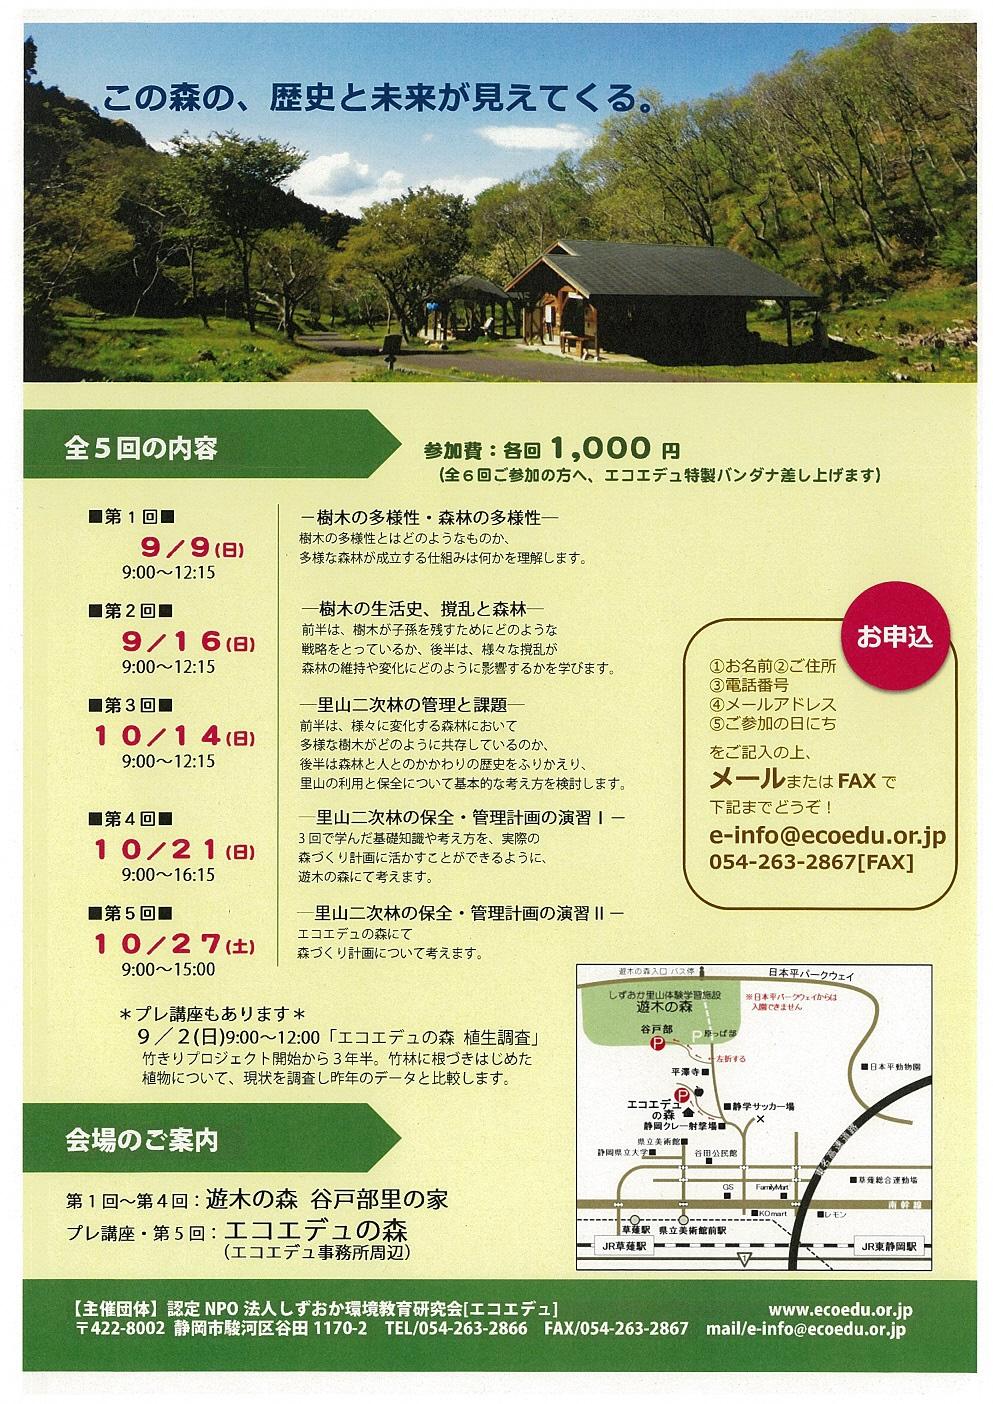 http://www.shizutan.jp/learning/2018/09/12/images/H30%E6%A3%AE%E3%81%A5%E3%81%8F%E3%82%8A%E8%AC%9B%E5%BA%A70002.jpg